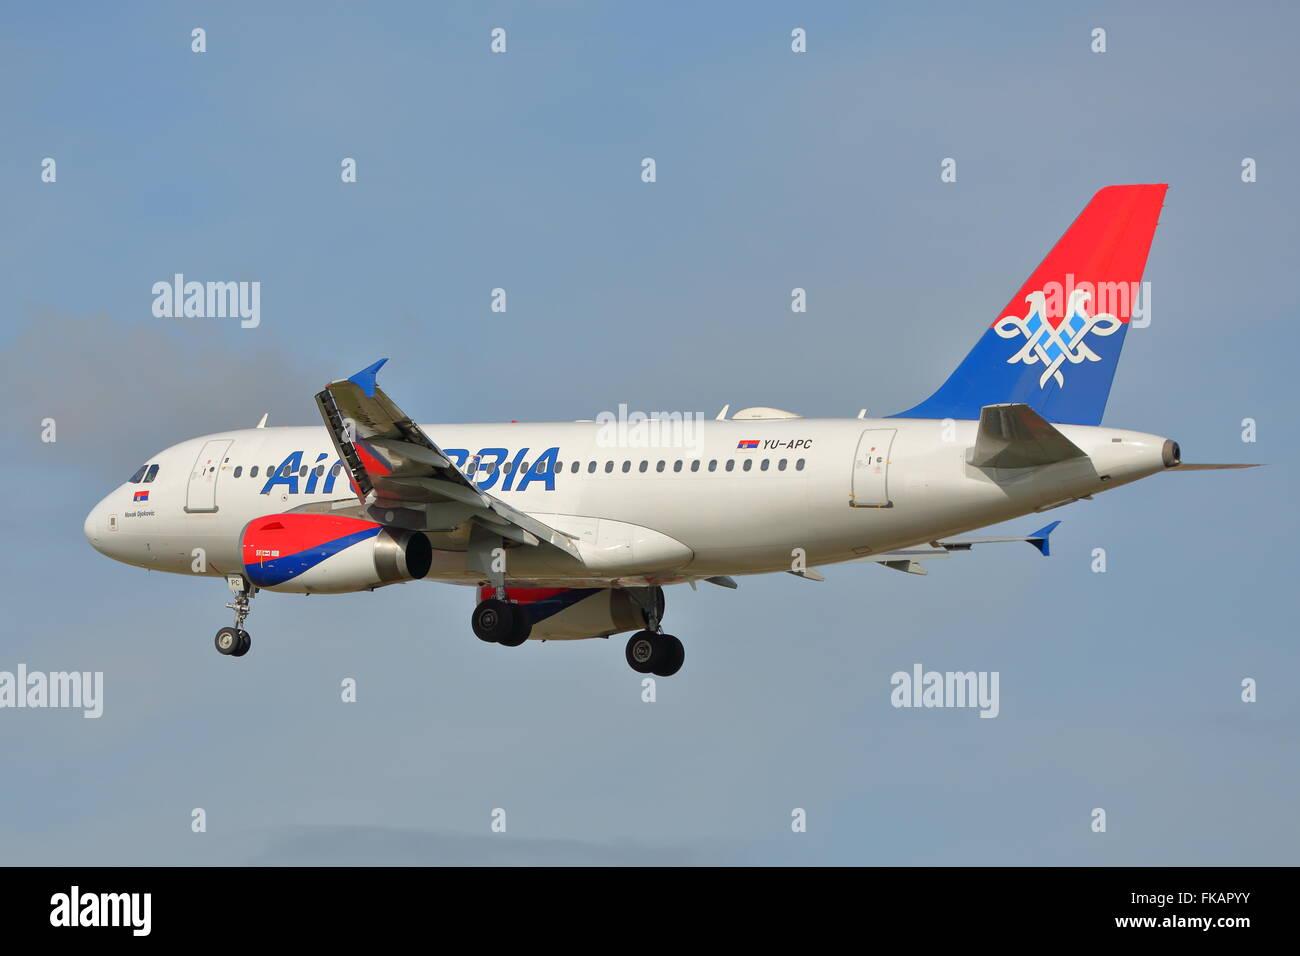 Air Serbia Airbus A319 YU-APC landing at London Heathrow Airport - Stock Image